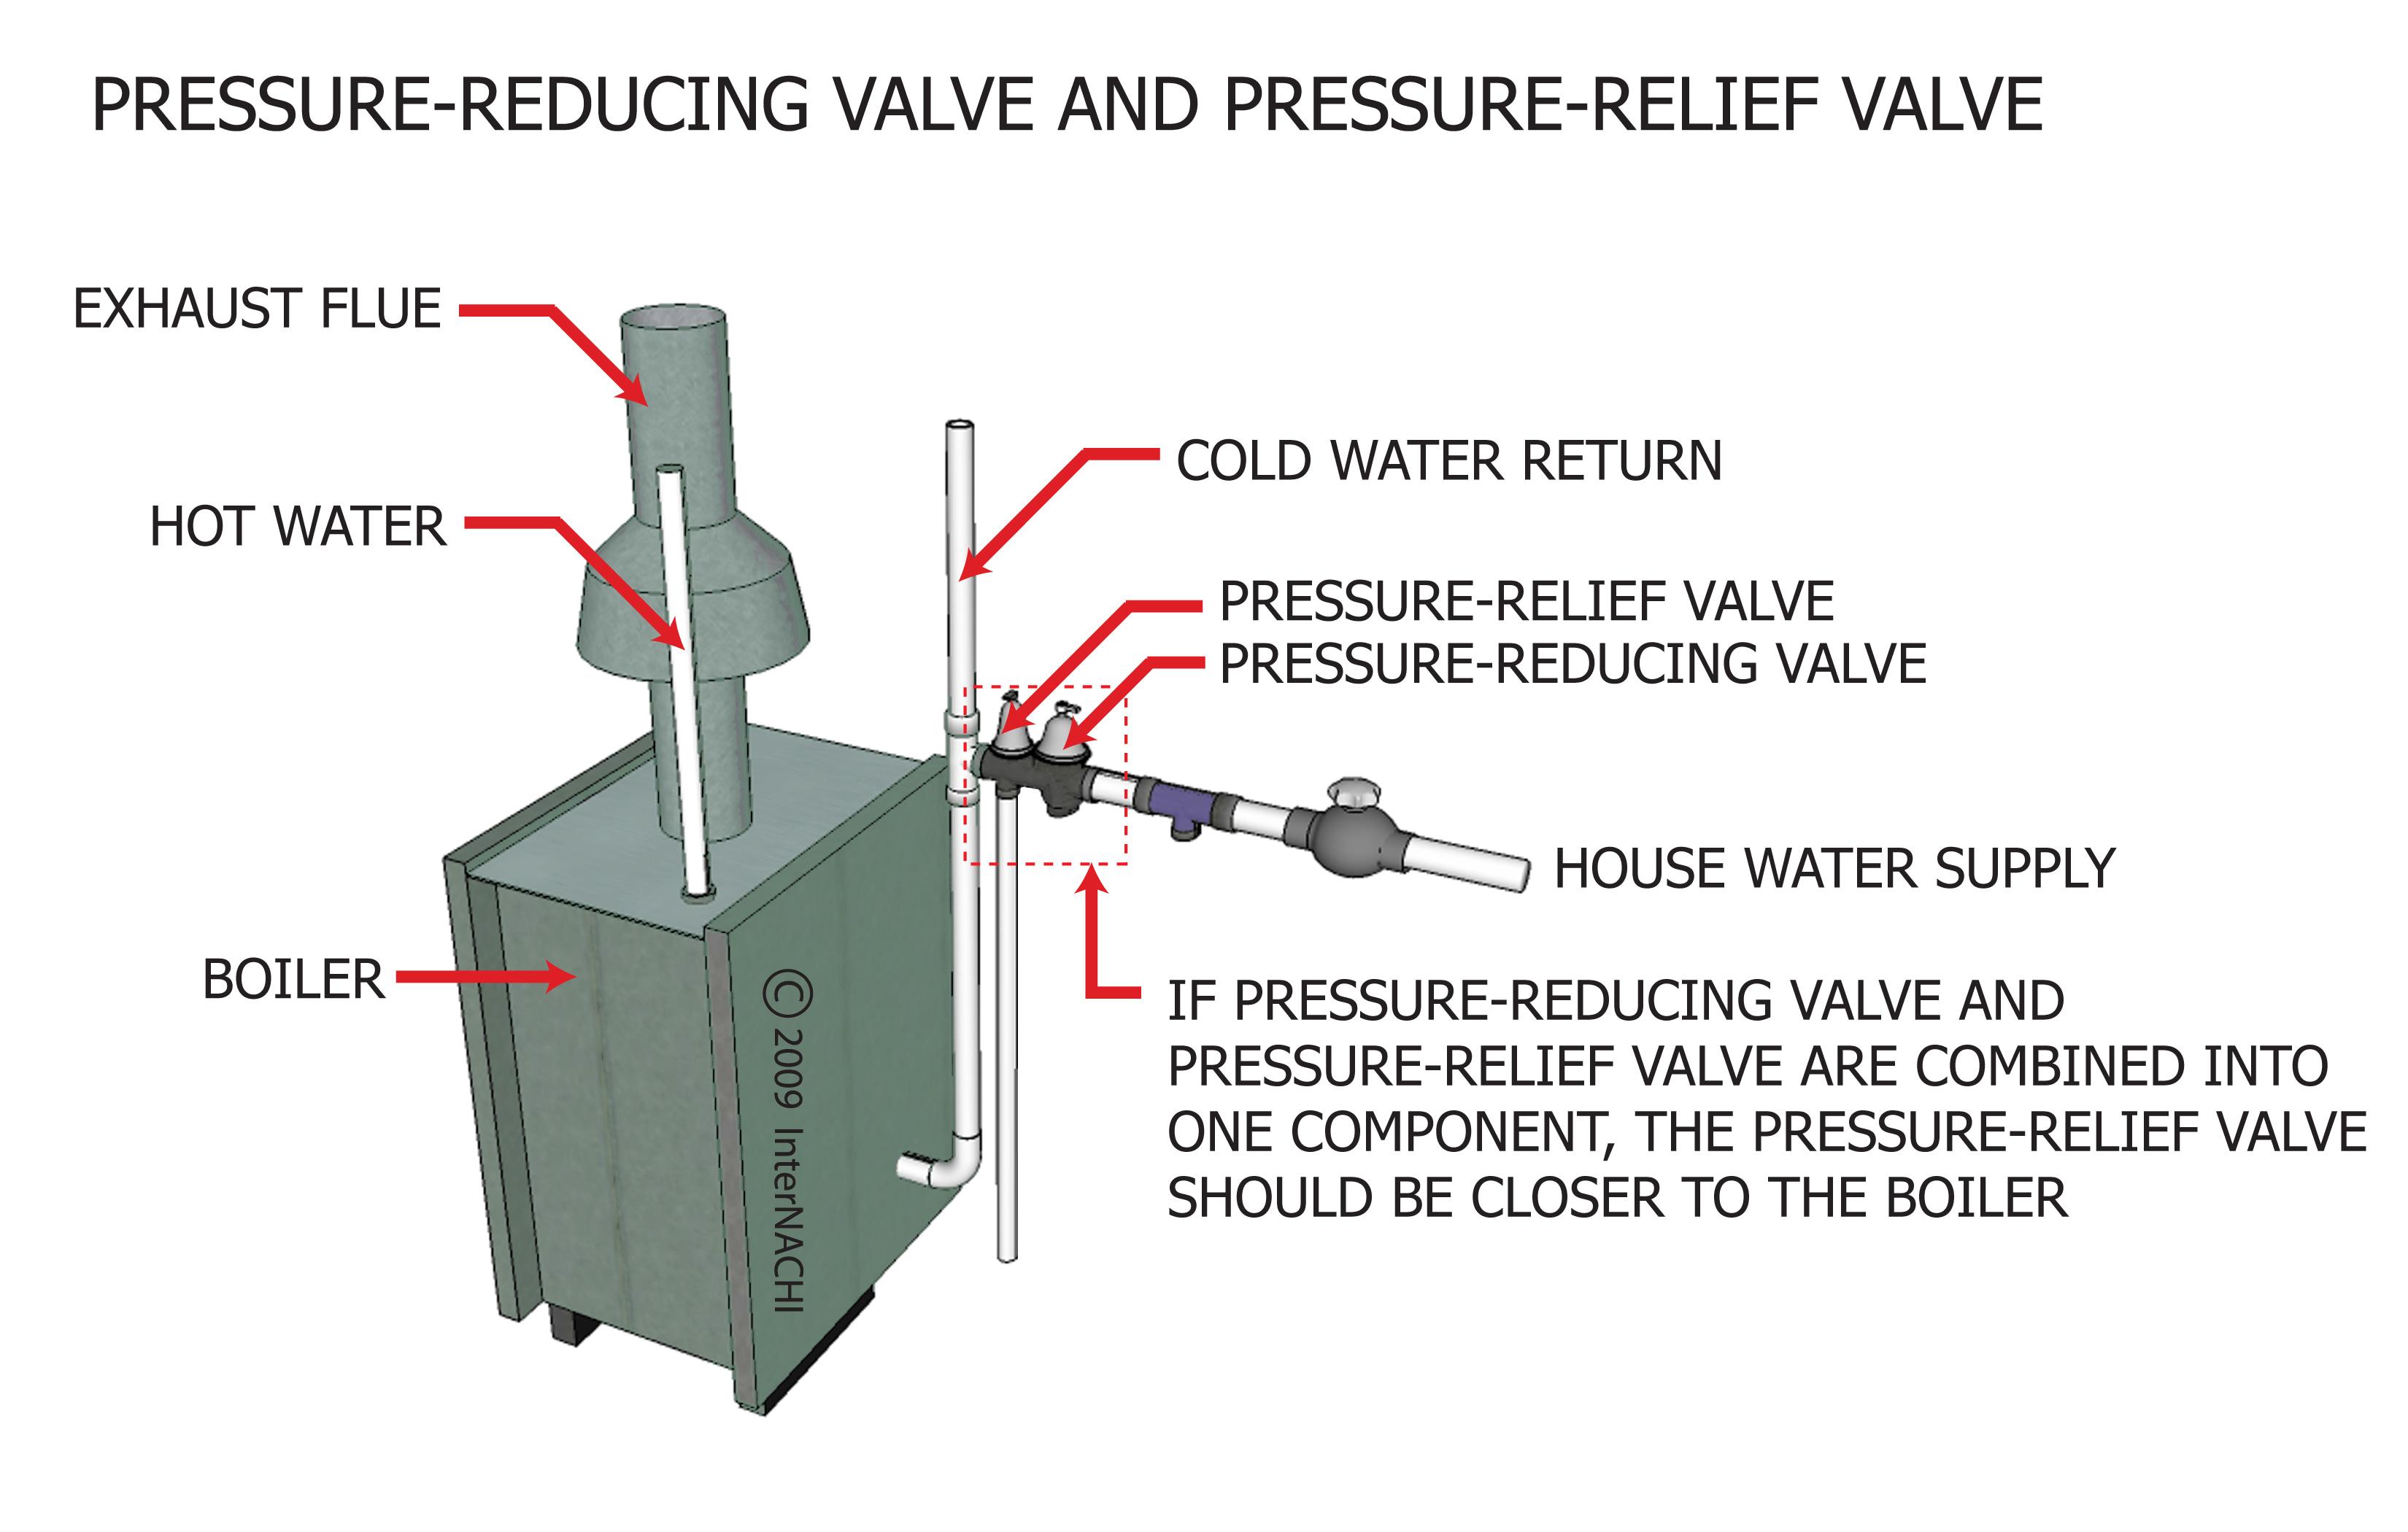 Pressure reducing and pressure relief valves.